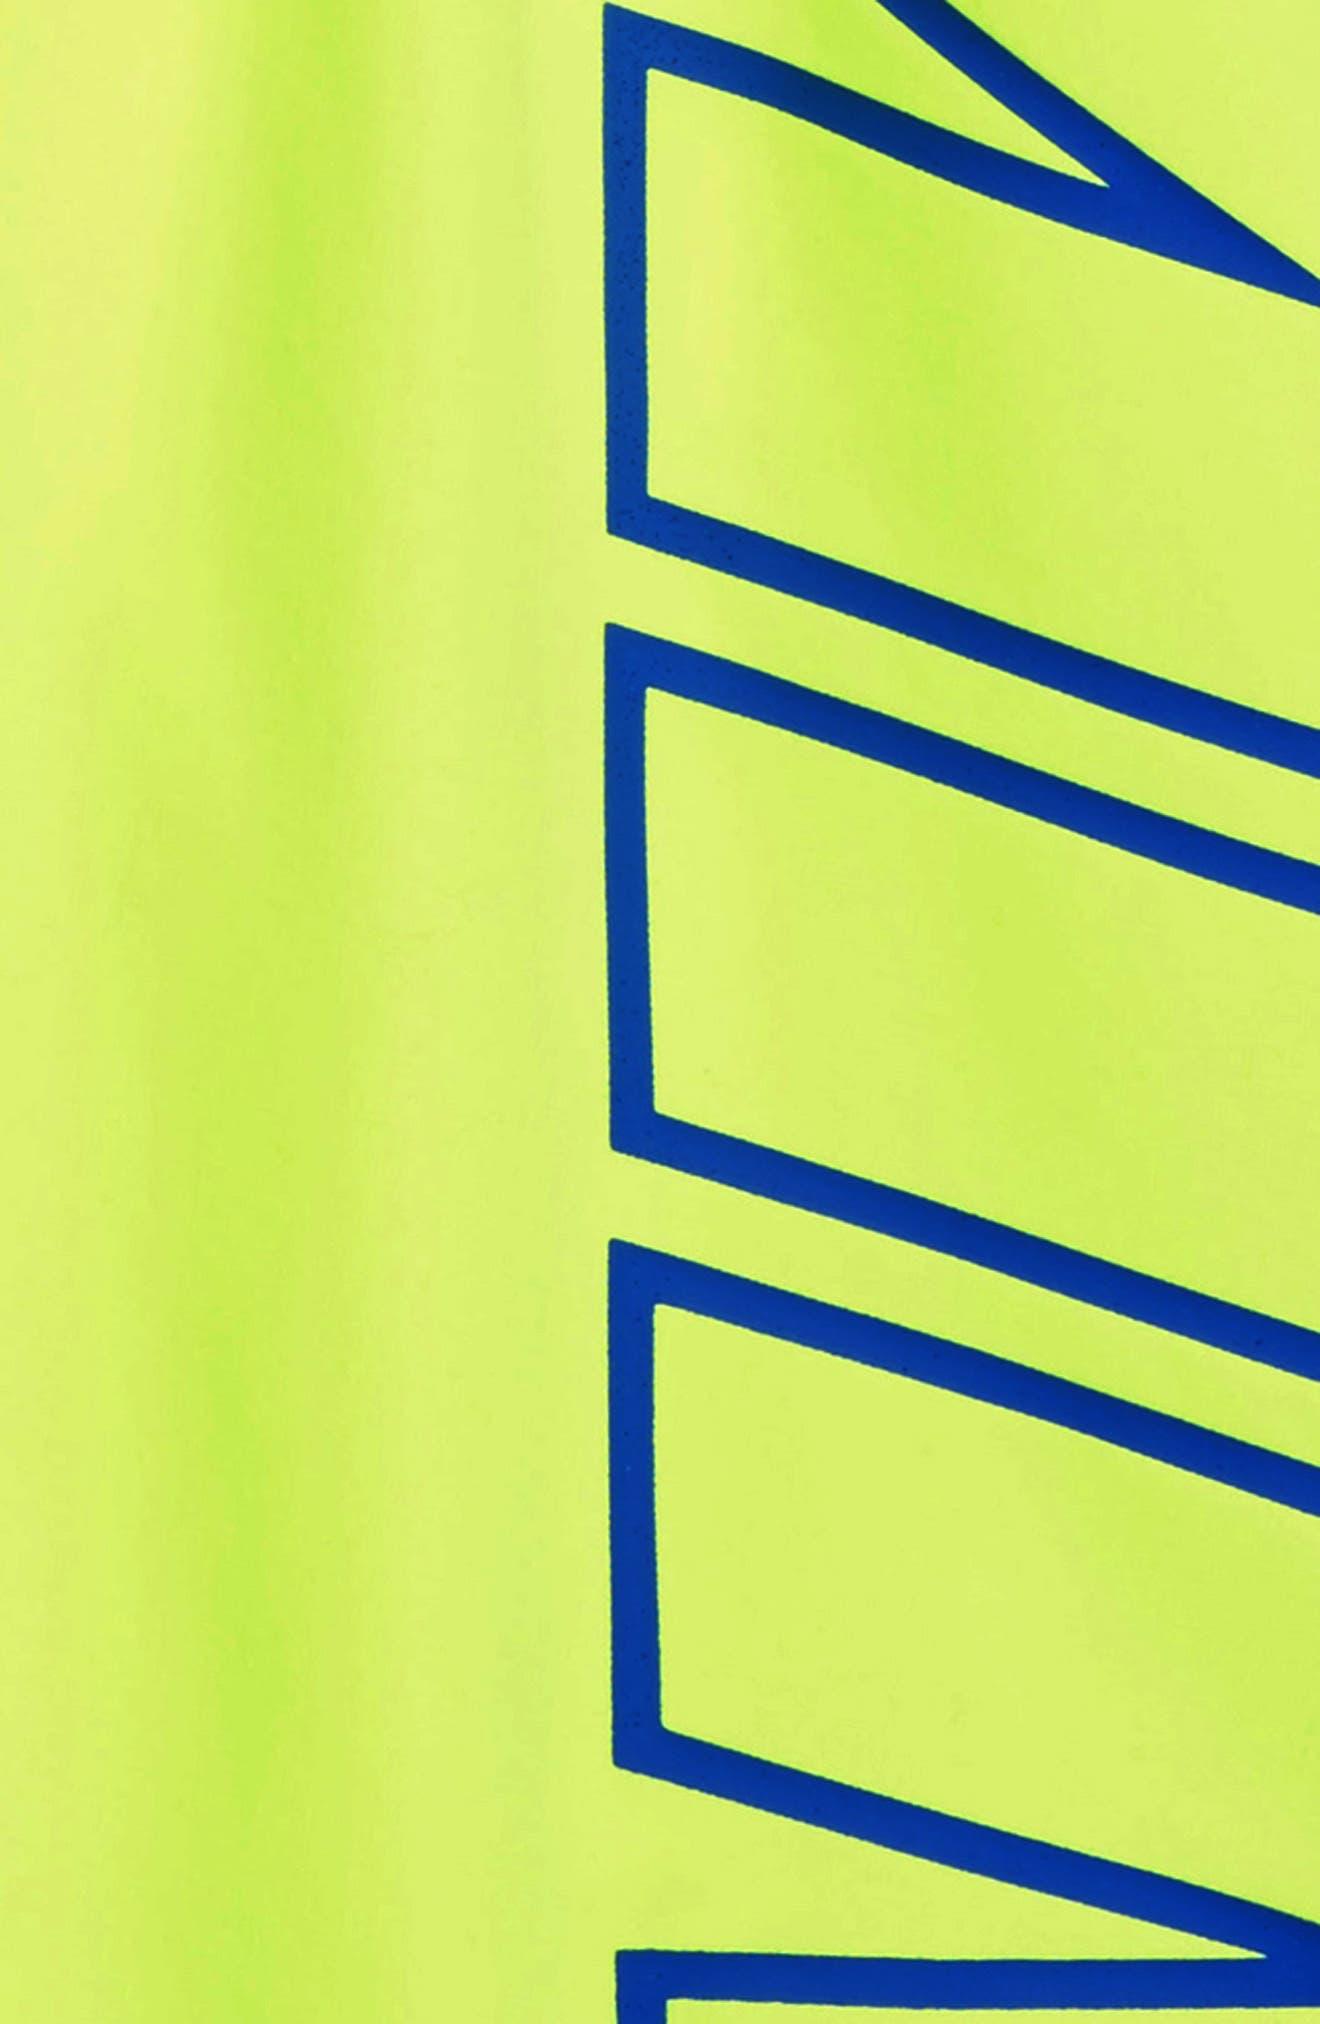 Breaker Volley Shorts,                             Alternate thumbnail 2, color,                             Volt